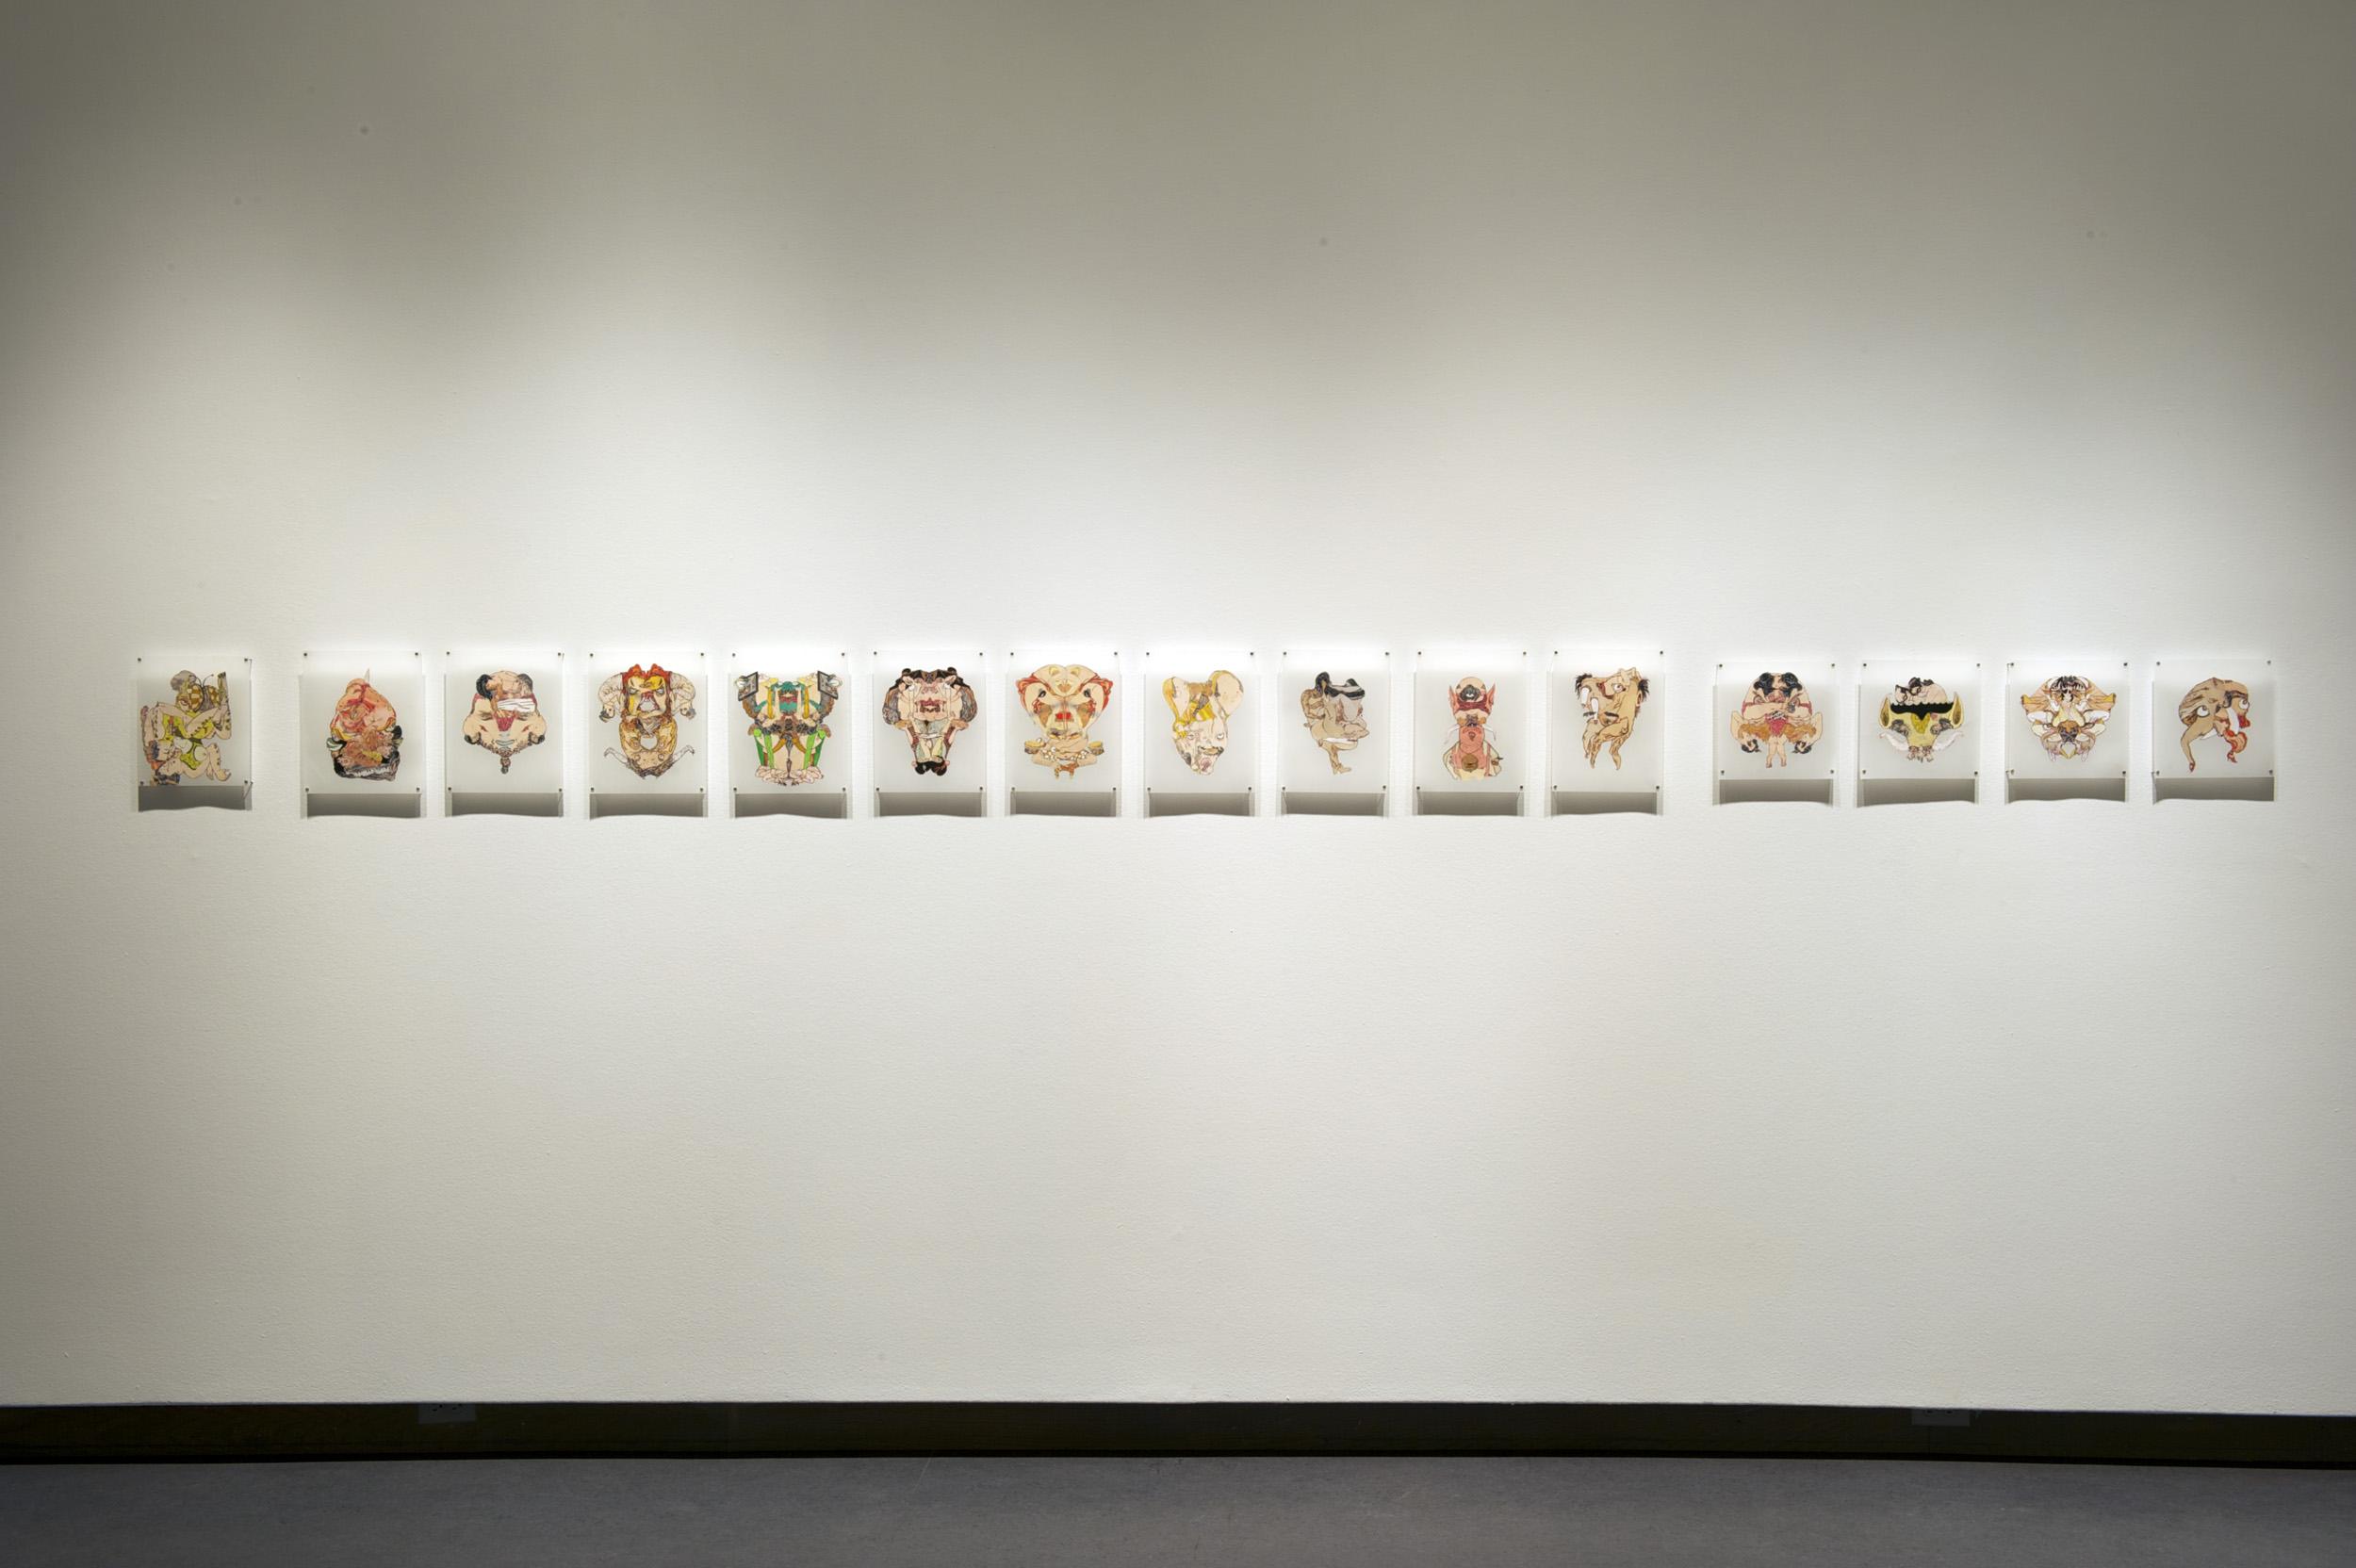 Of Shunga & Monsters, 2007 - 2008, acrylic, ink and collage on polyethylene drafting film